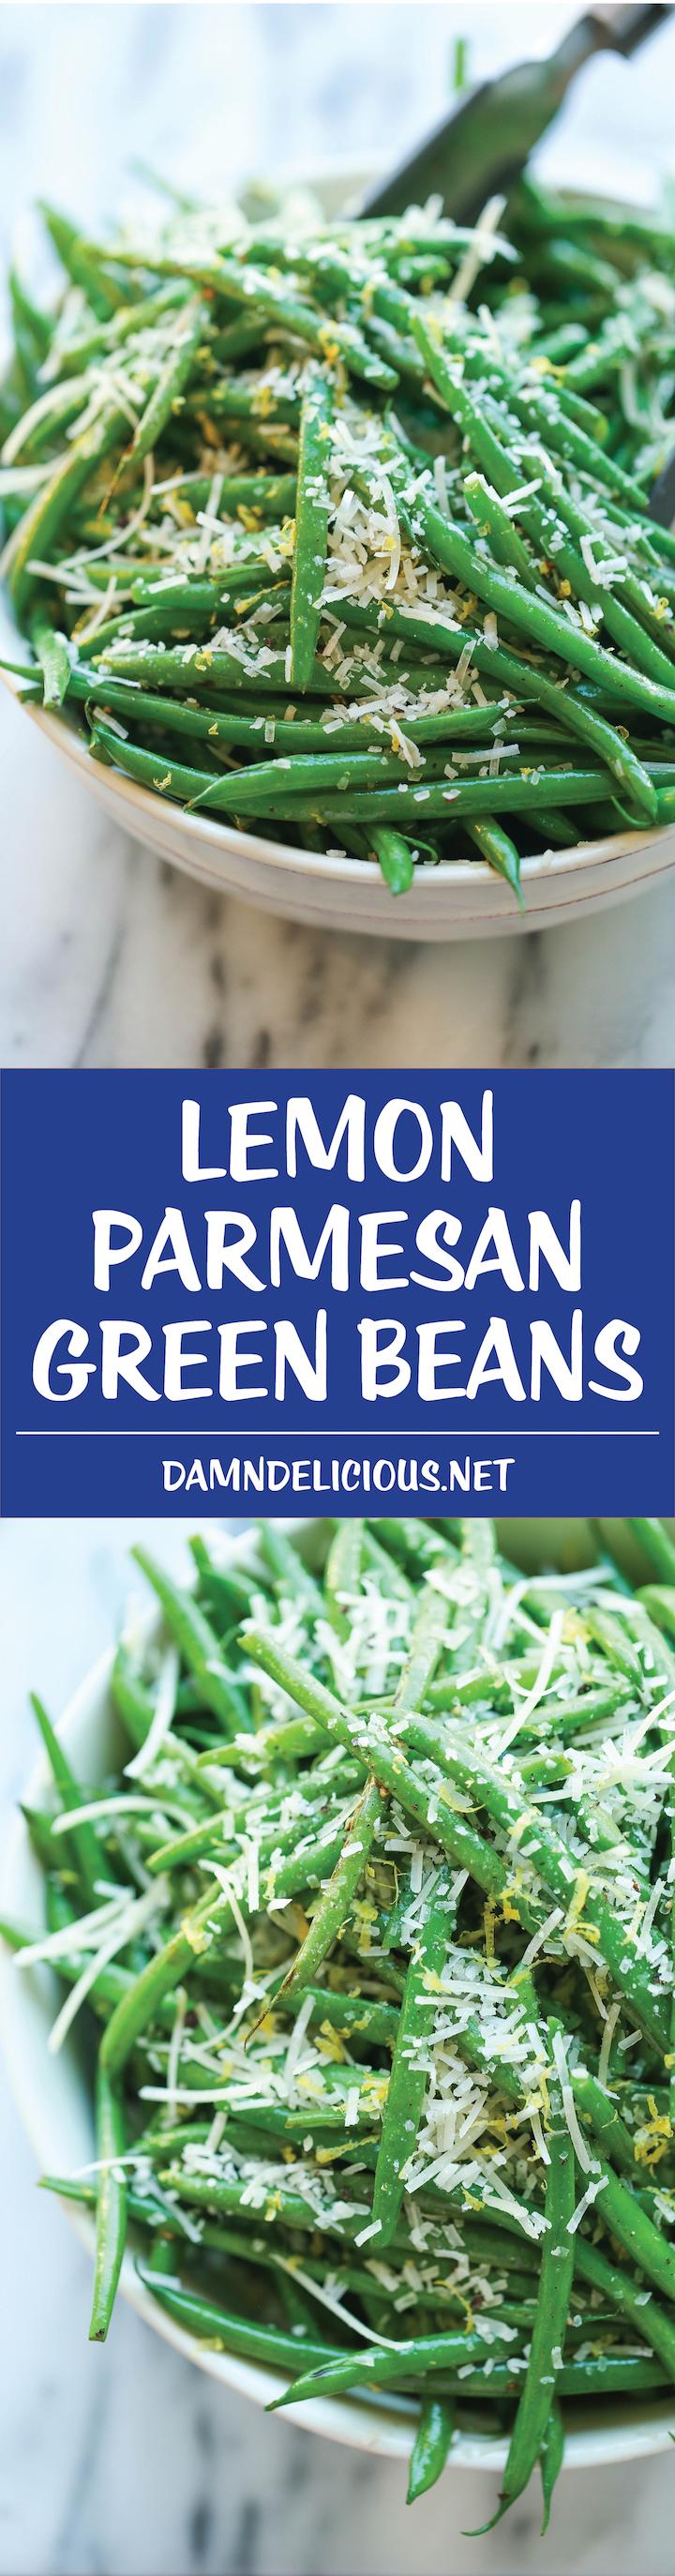 recipe: parmesan green beans skinnytaste [29]